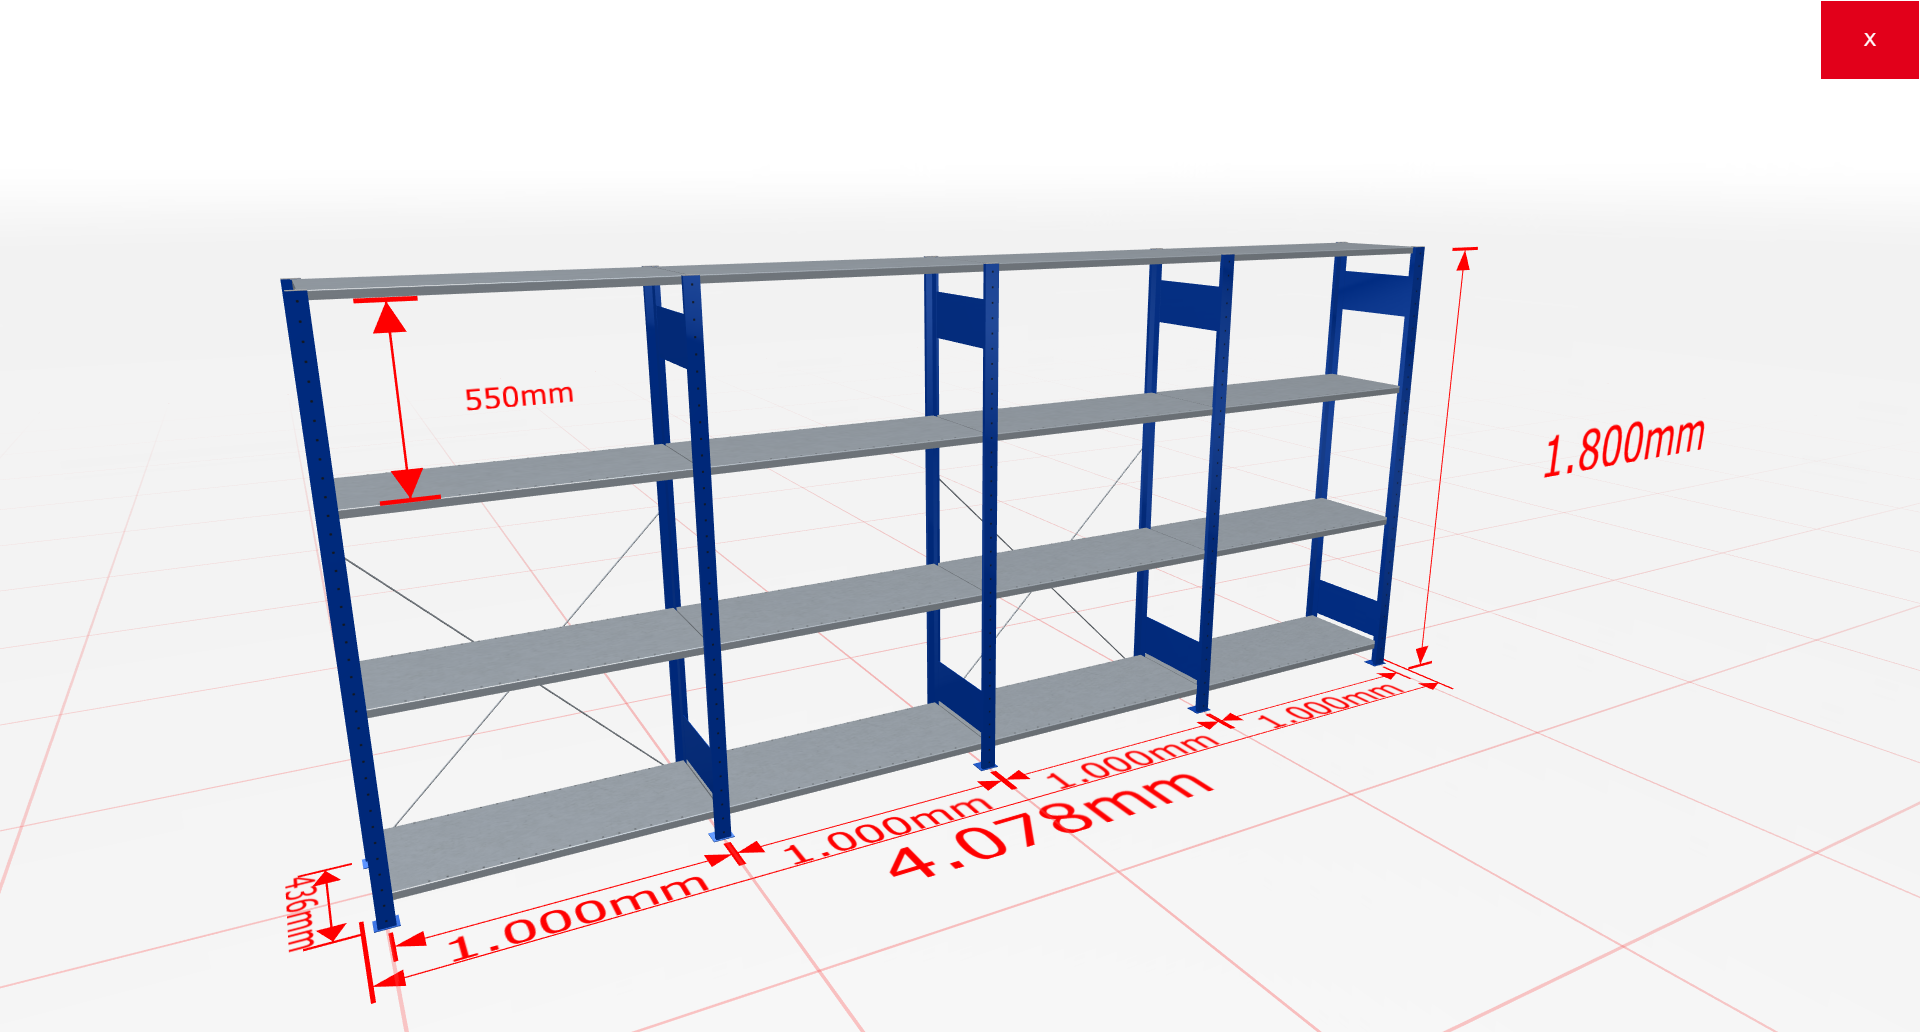 Fachbodenregal Komplettregal 1800x4078x400 mm (HxBxT) SCHULTE Lagertechnik blau 4 Ebenen  150 kg je Boden